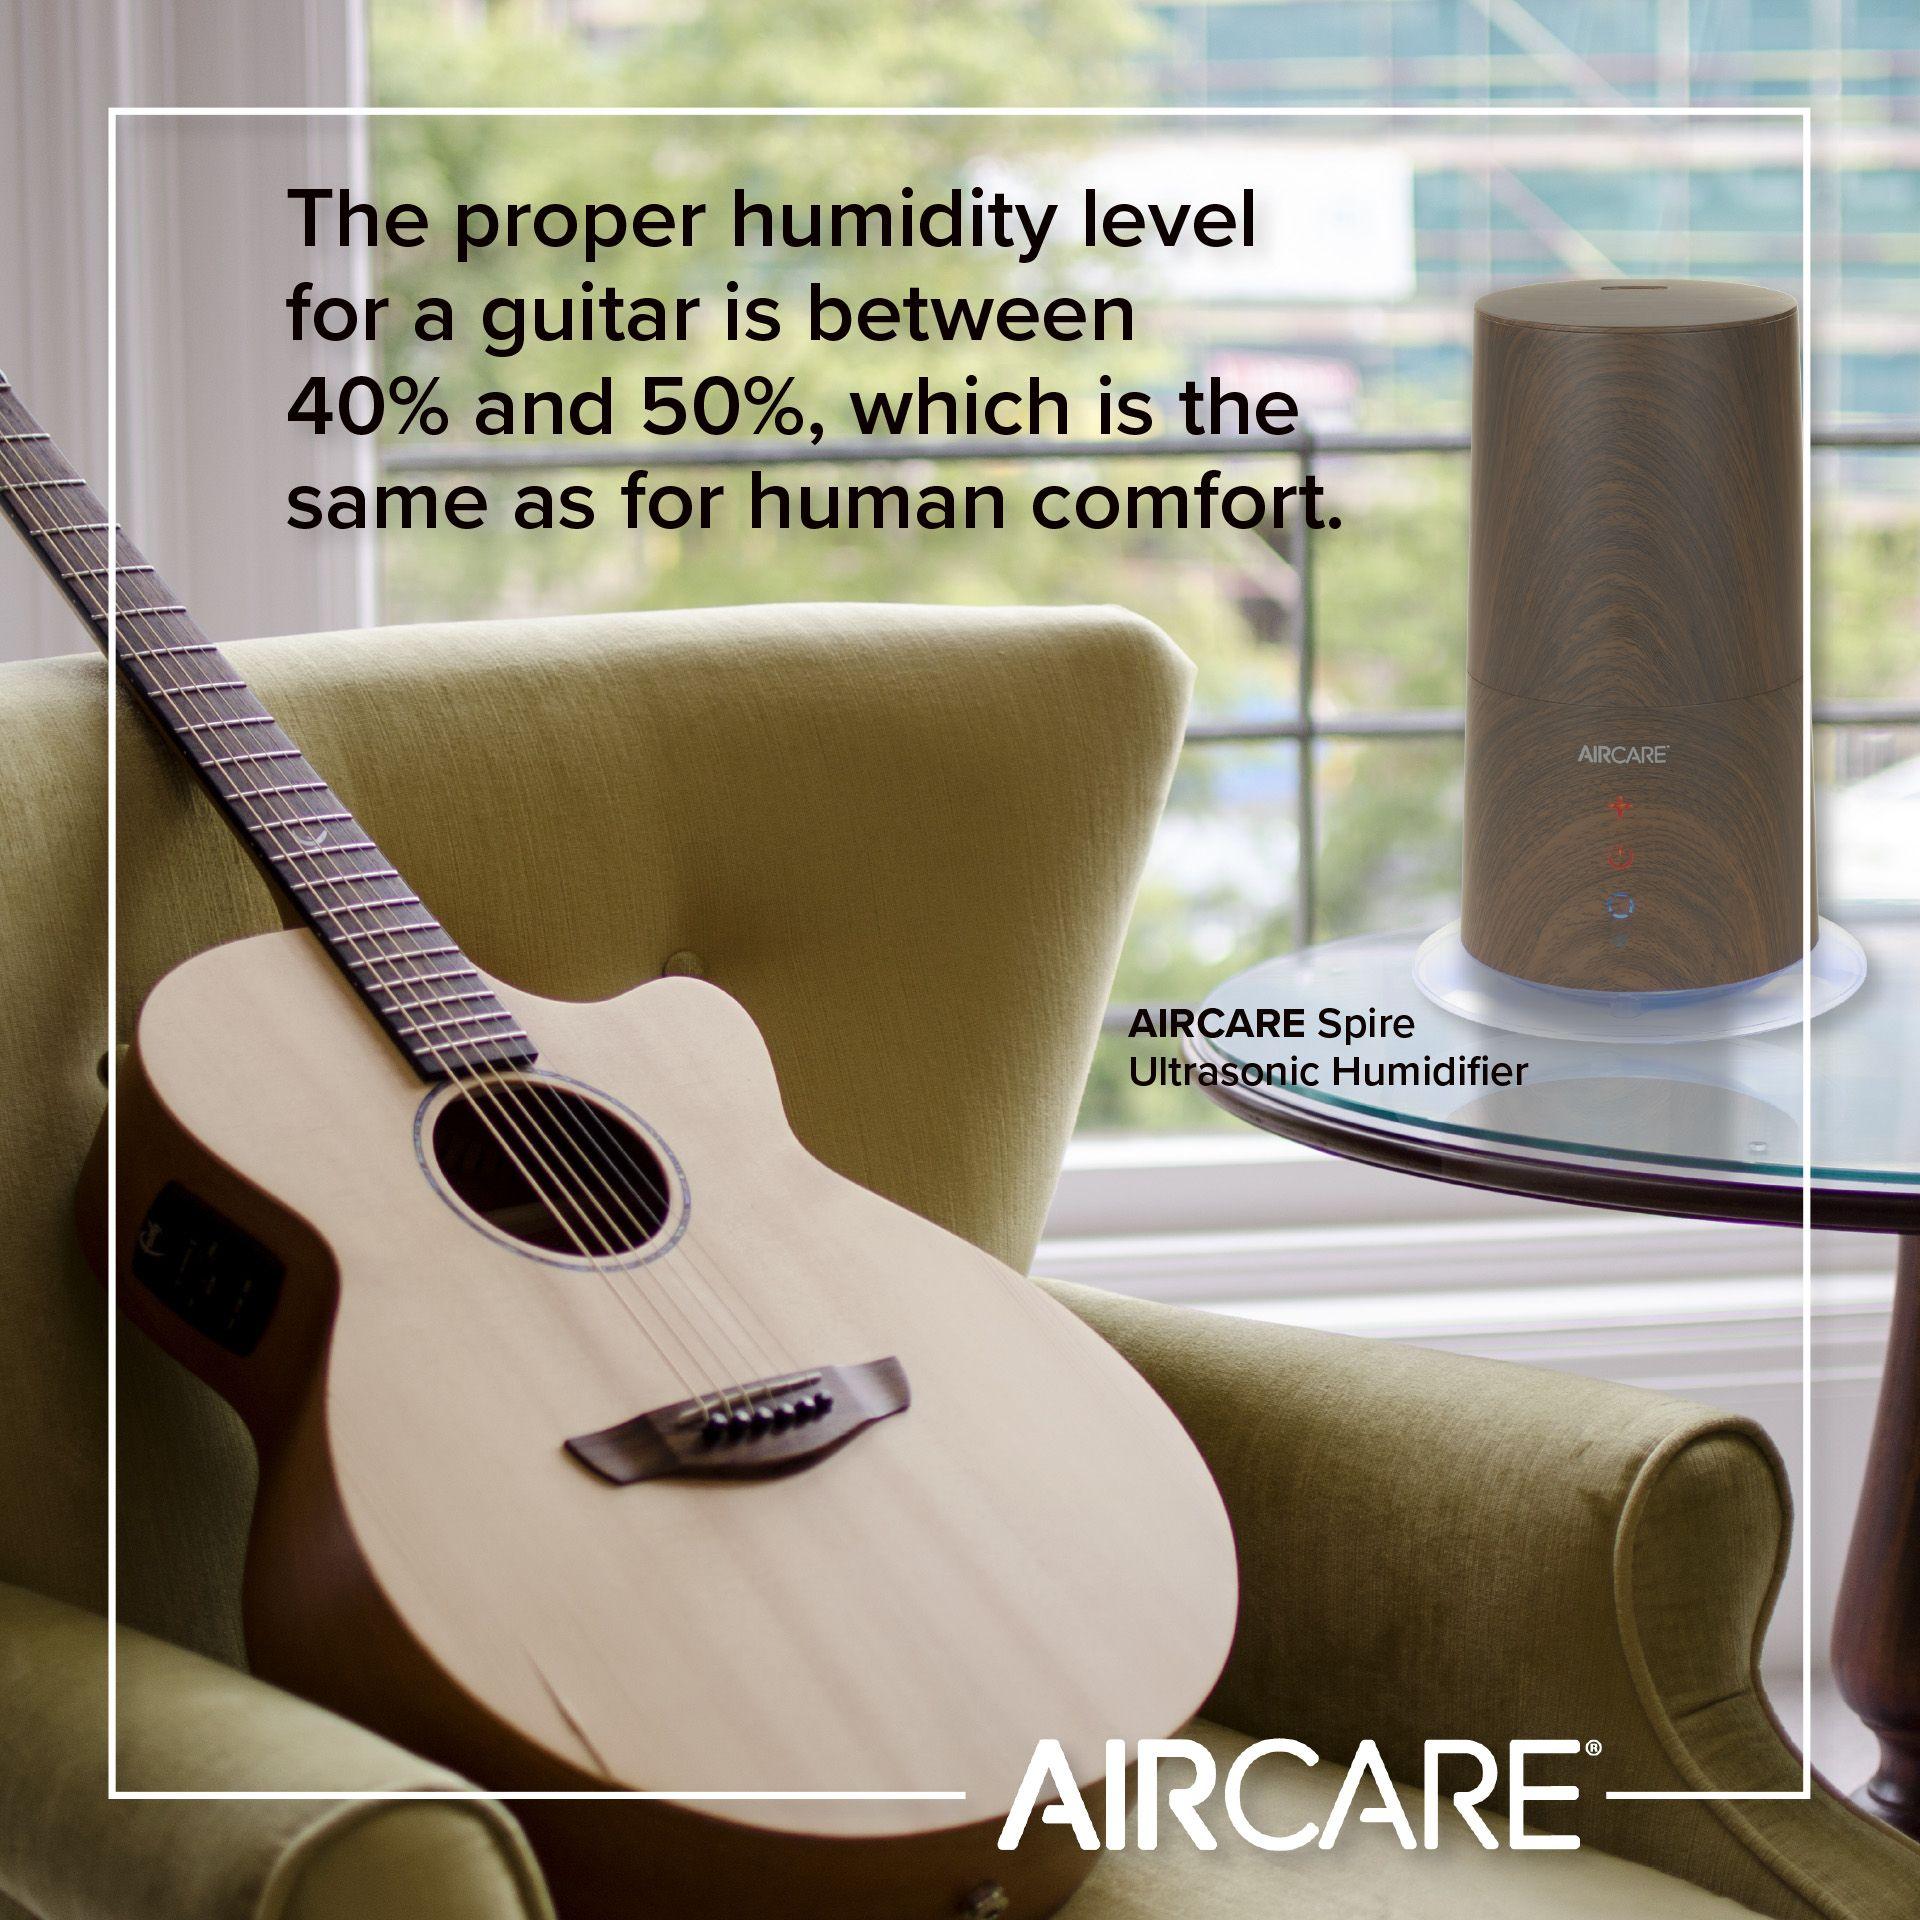 Pin By Jennifer Jones On My Work Humidity Levels Proper Guitar